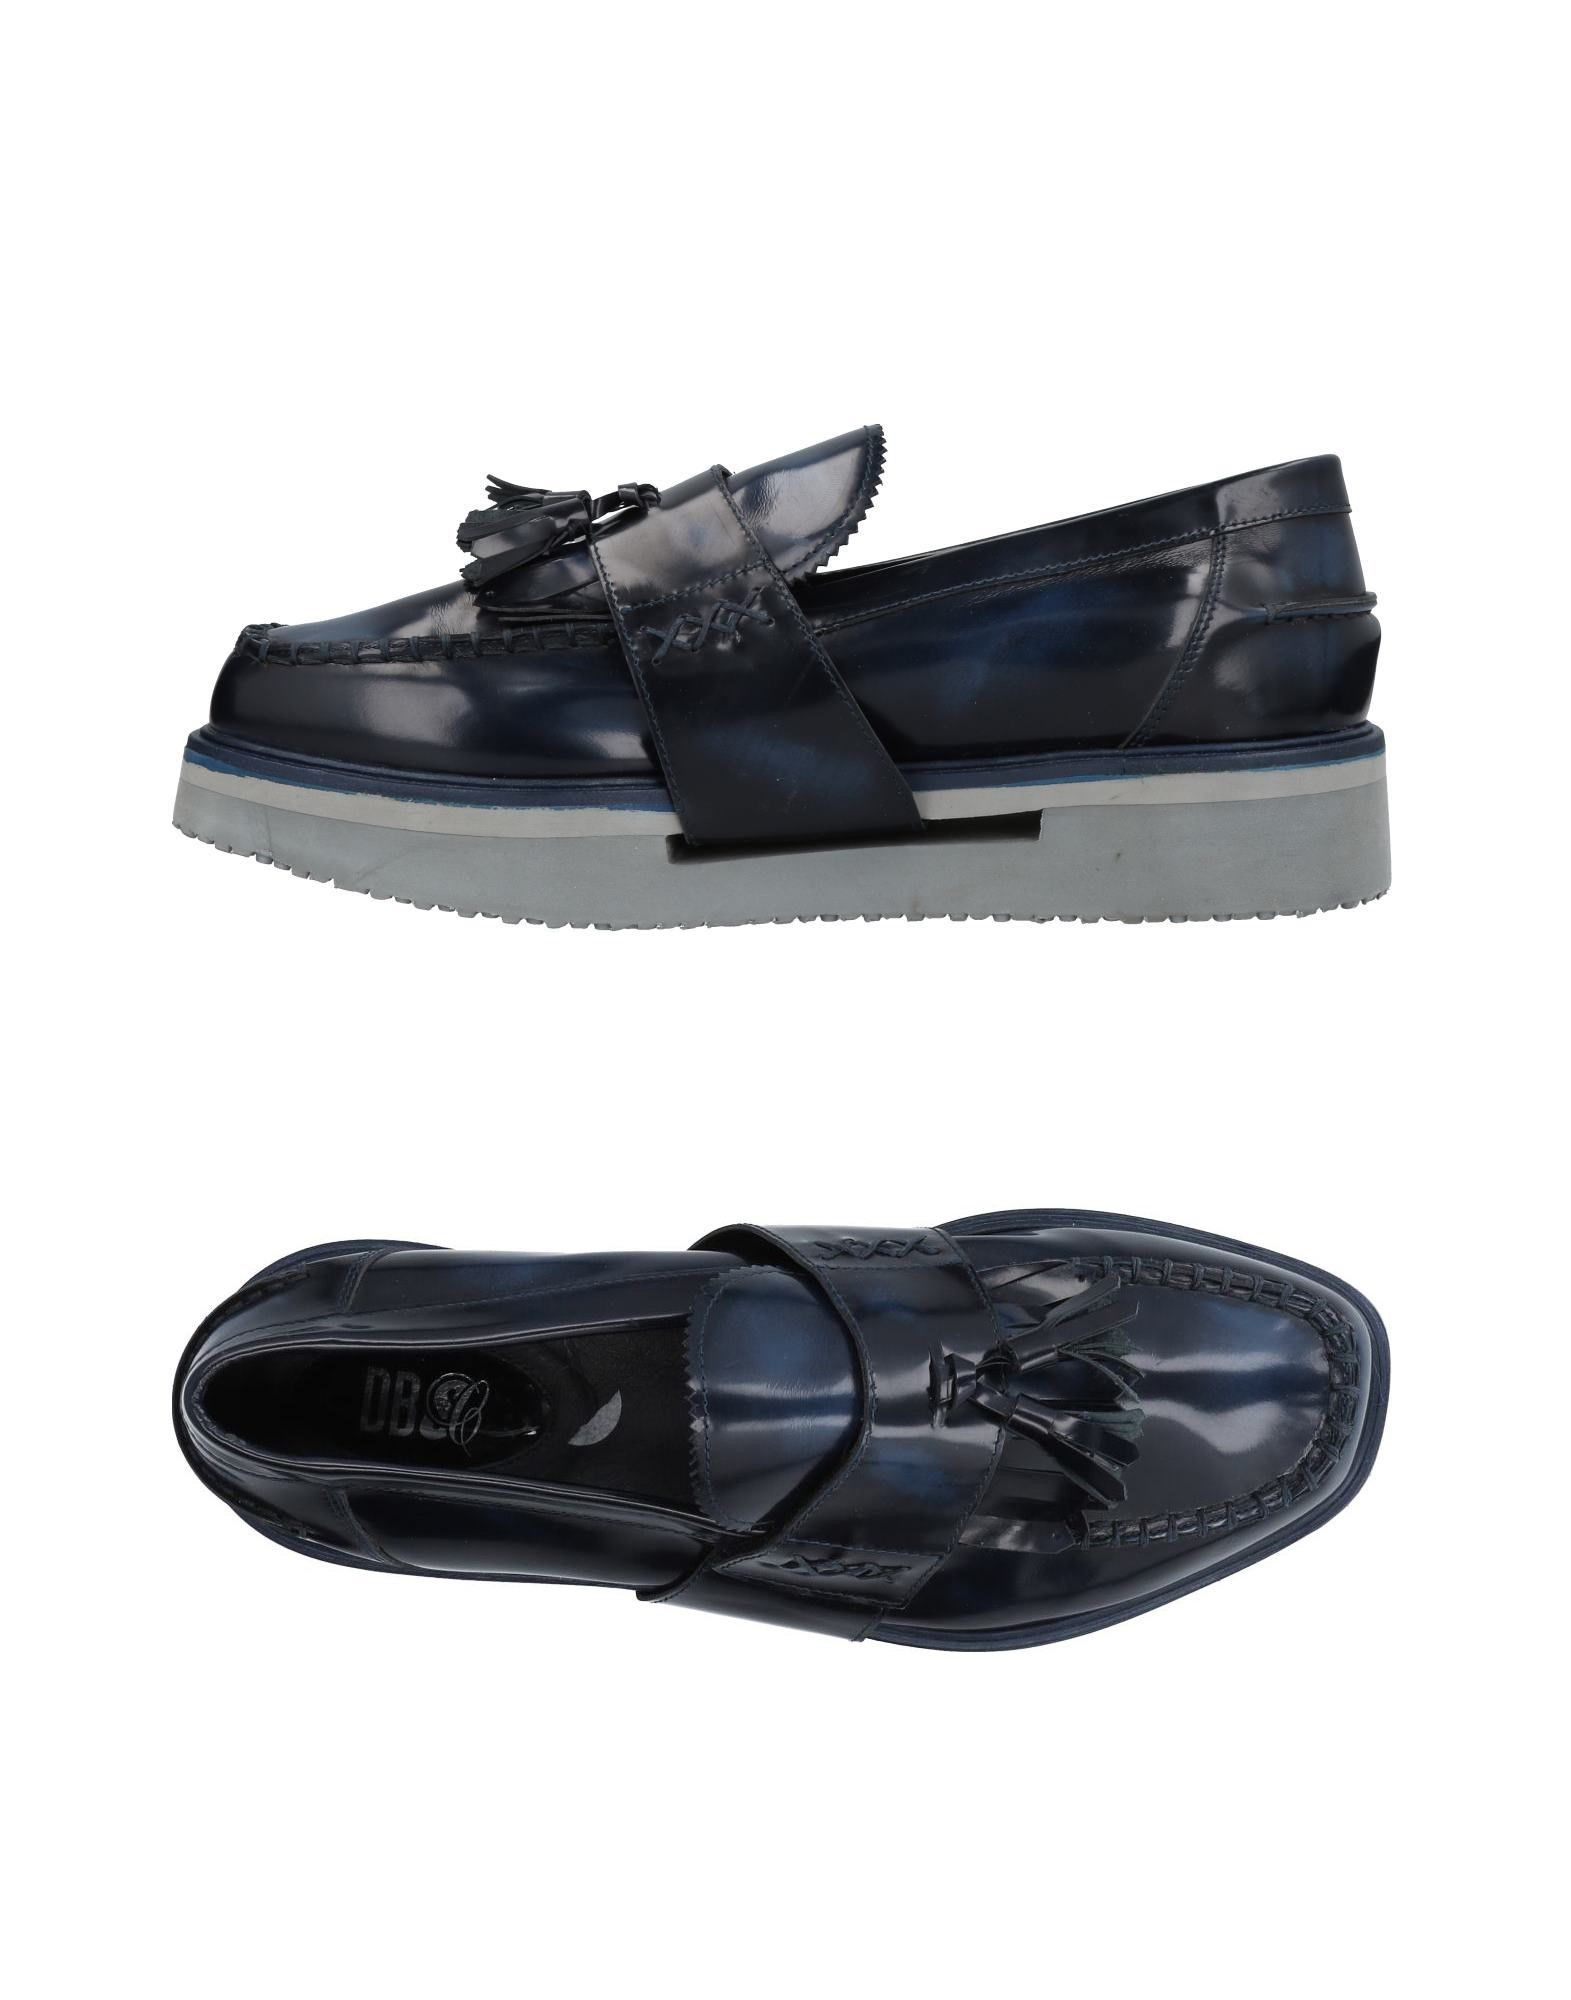 Dirk Bikkembergs Mokassins Herren  11461340XV Gute Qualität beliebte Schuhe